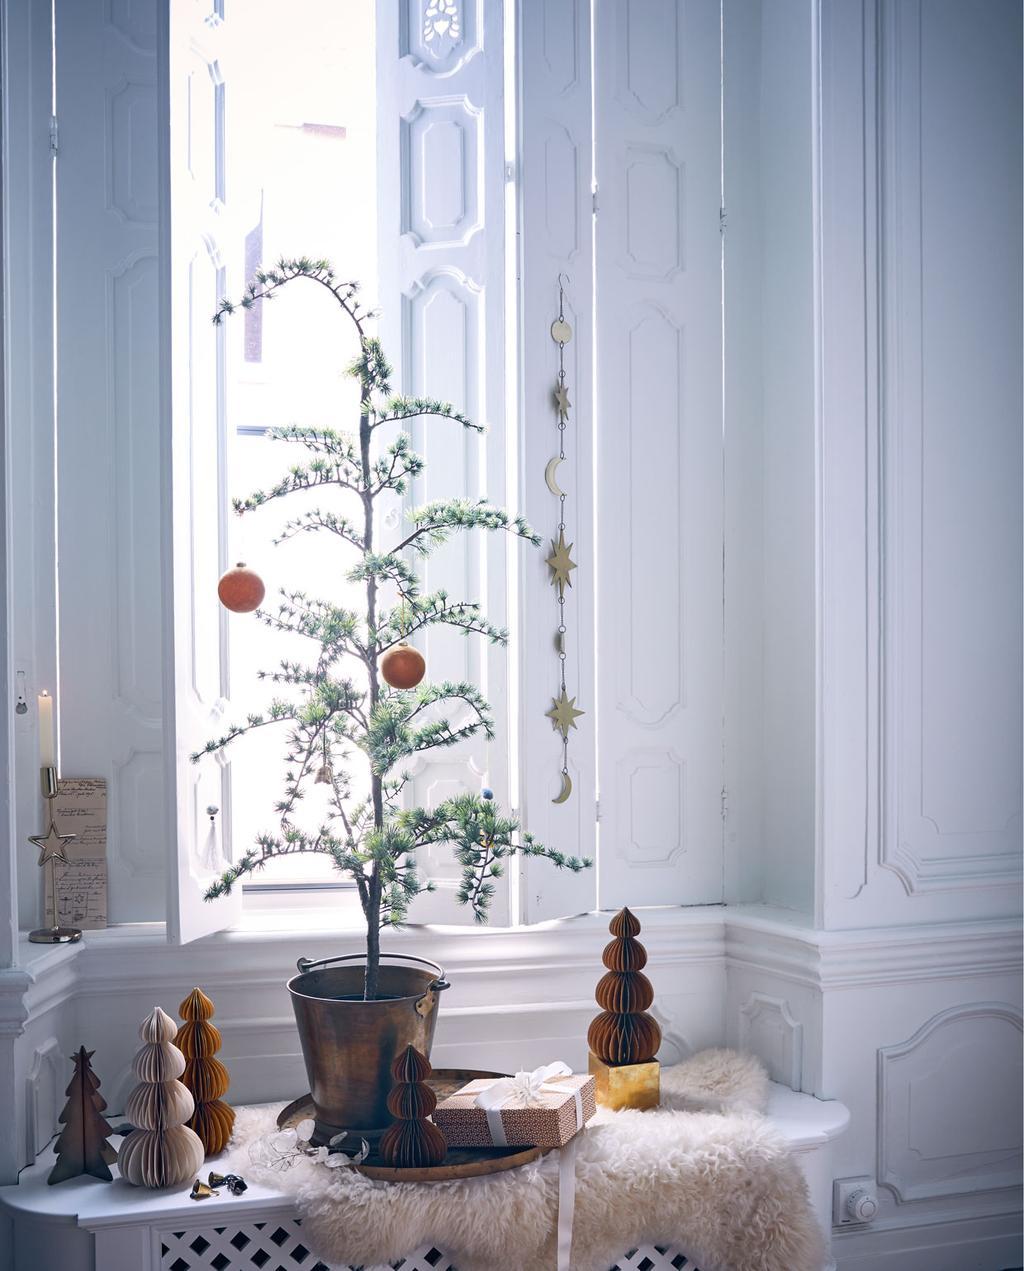 vtwonen 12-2019 | kerst raamkozijn boompje